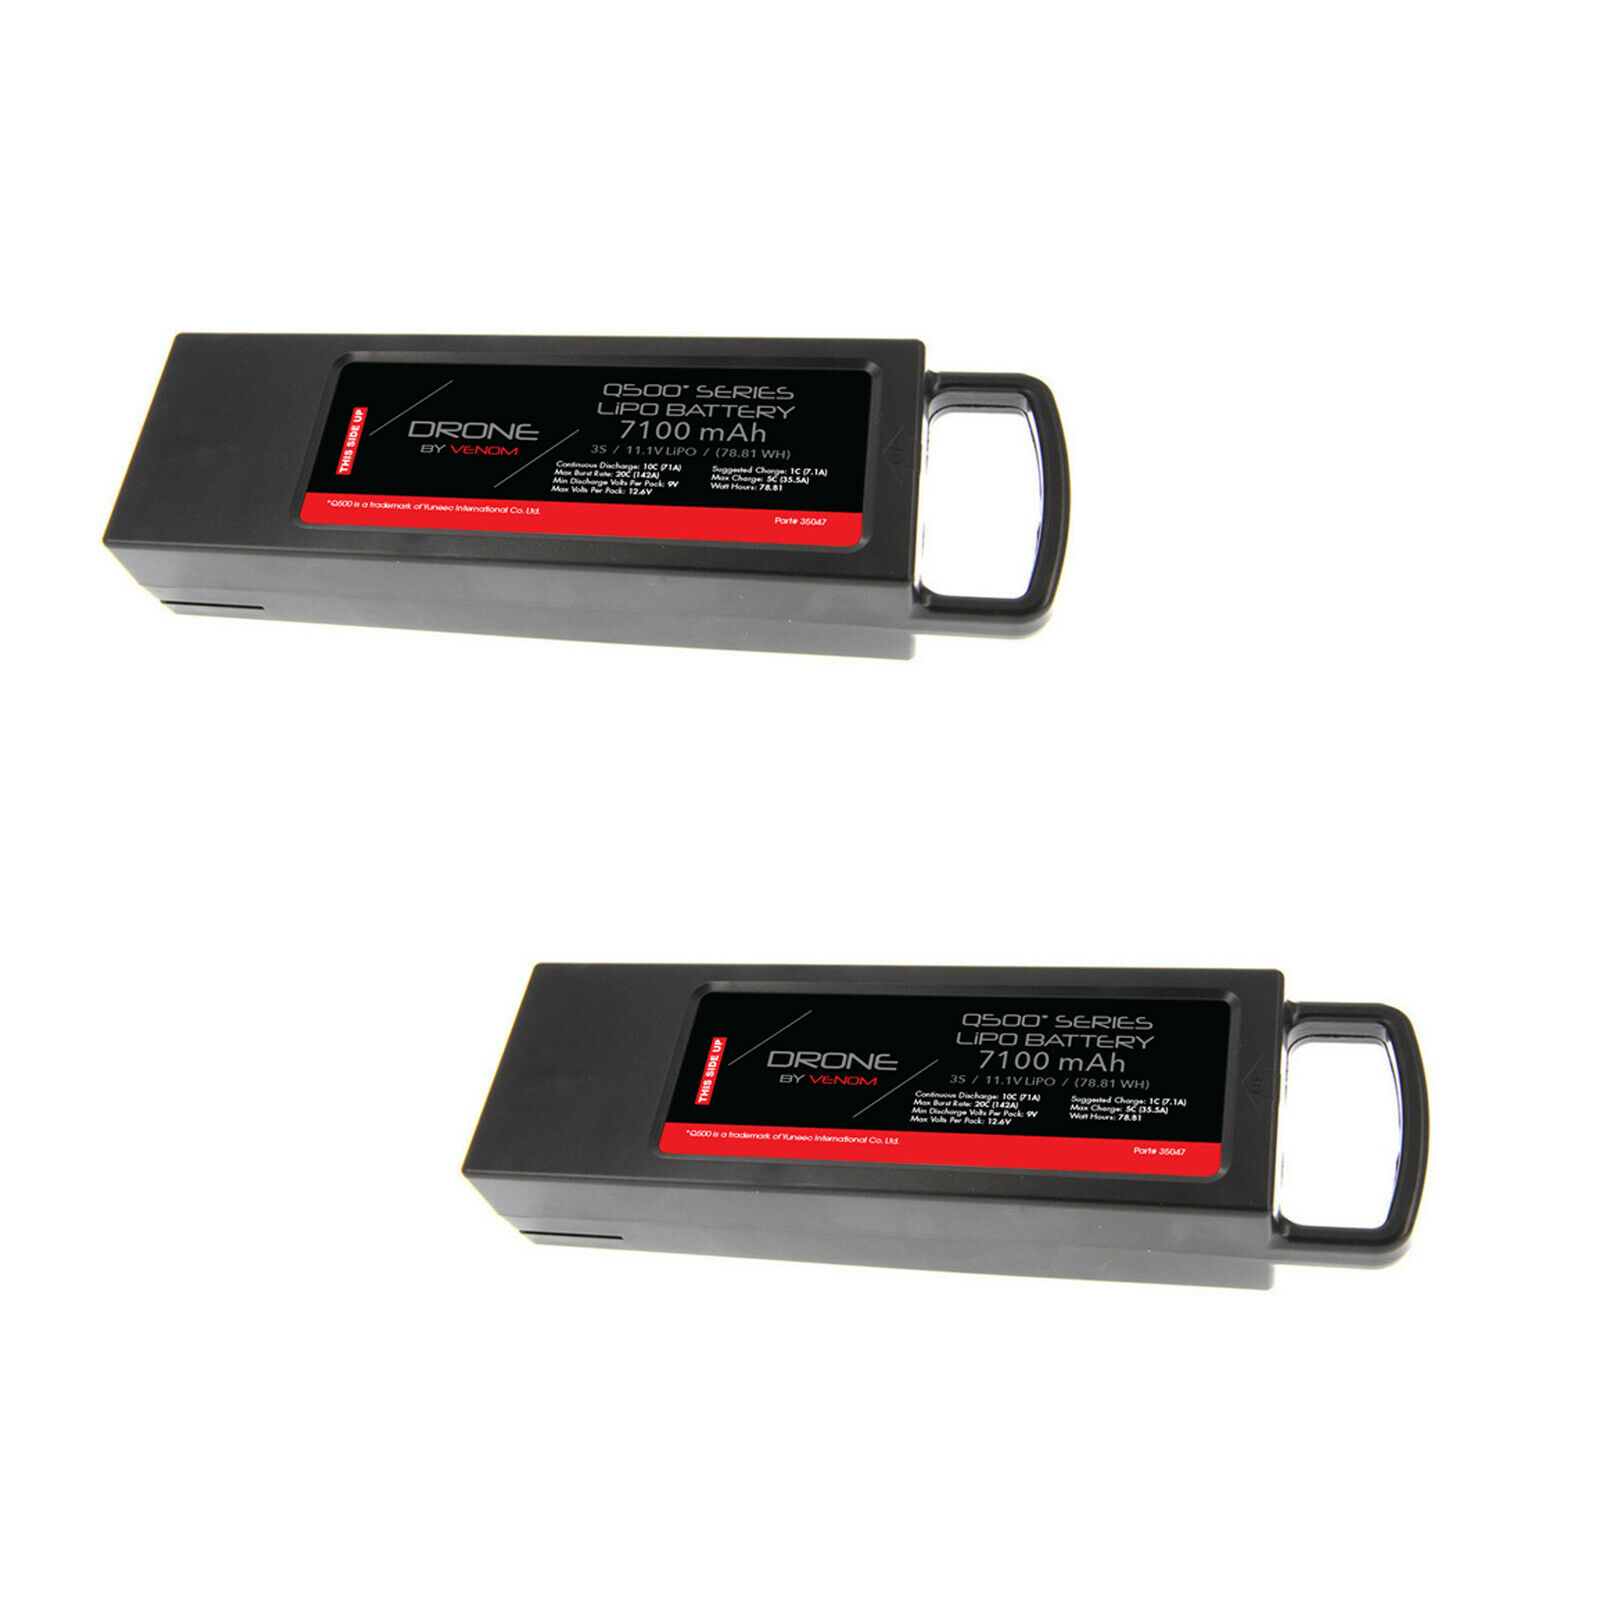 Yuneec Q500 3S 7100mAh 11.1V Radio Control Series Drone Lipo Batería por Venom x2 Packs